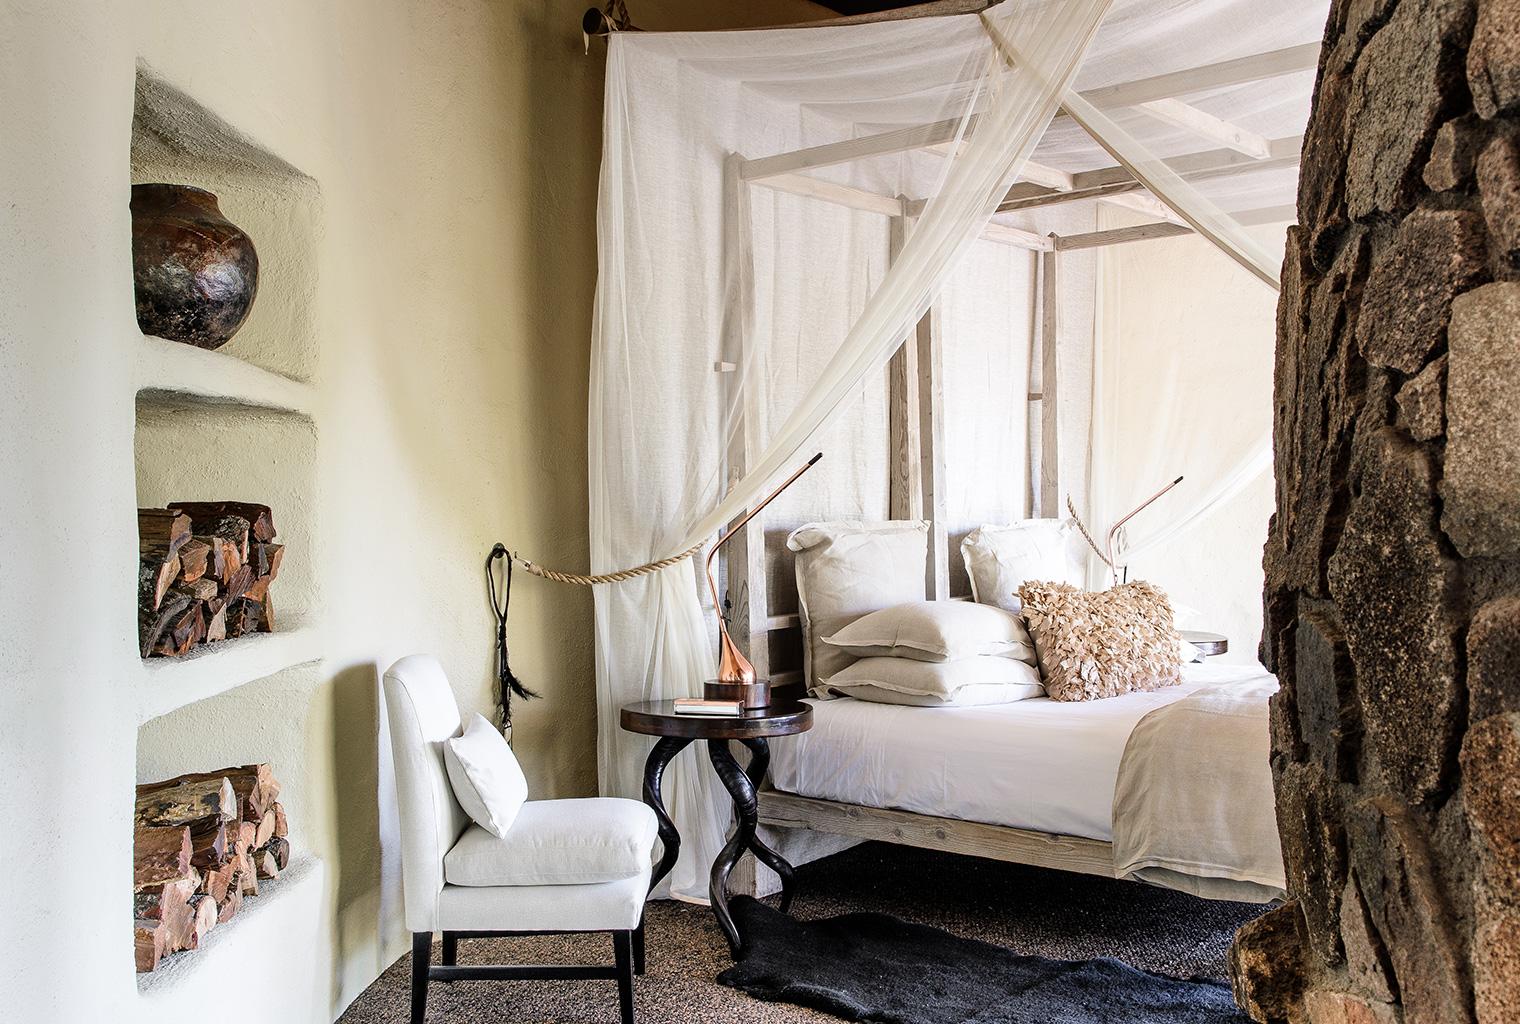 Singita-Boulders-Lodge-South-Africa-Bedroom